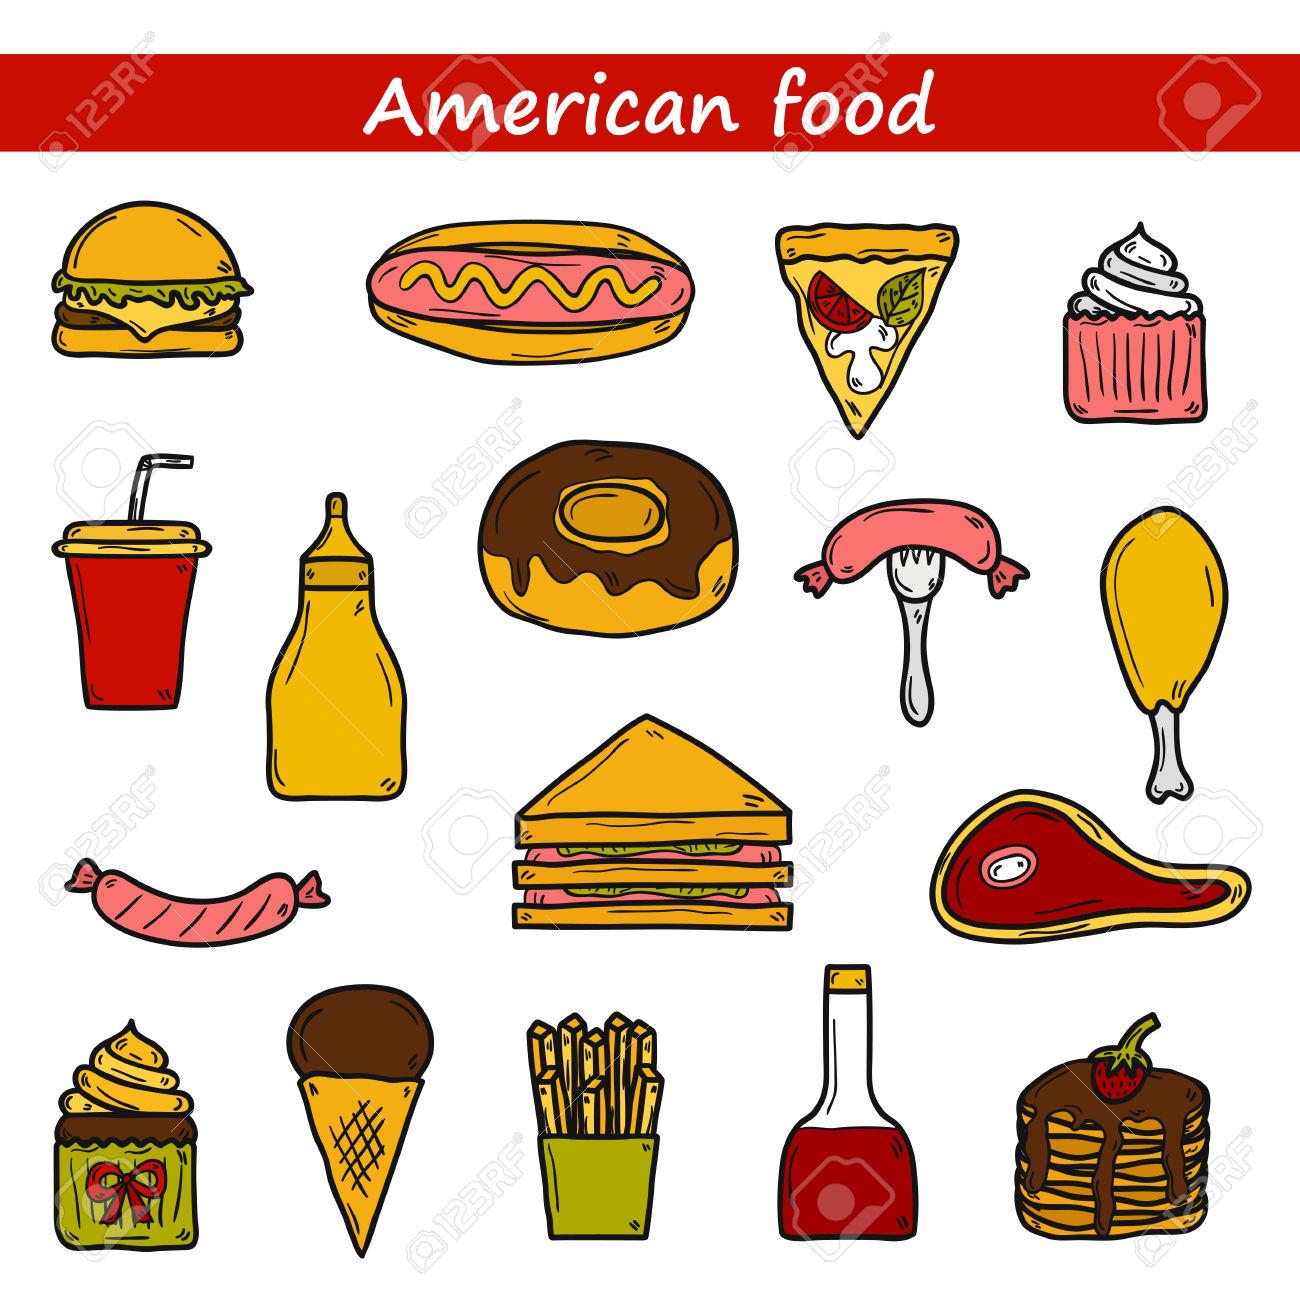 Set Of Cartoon Objects On American Food Theme: Fried Potato.